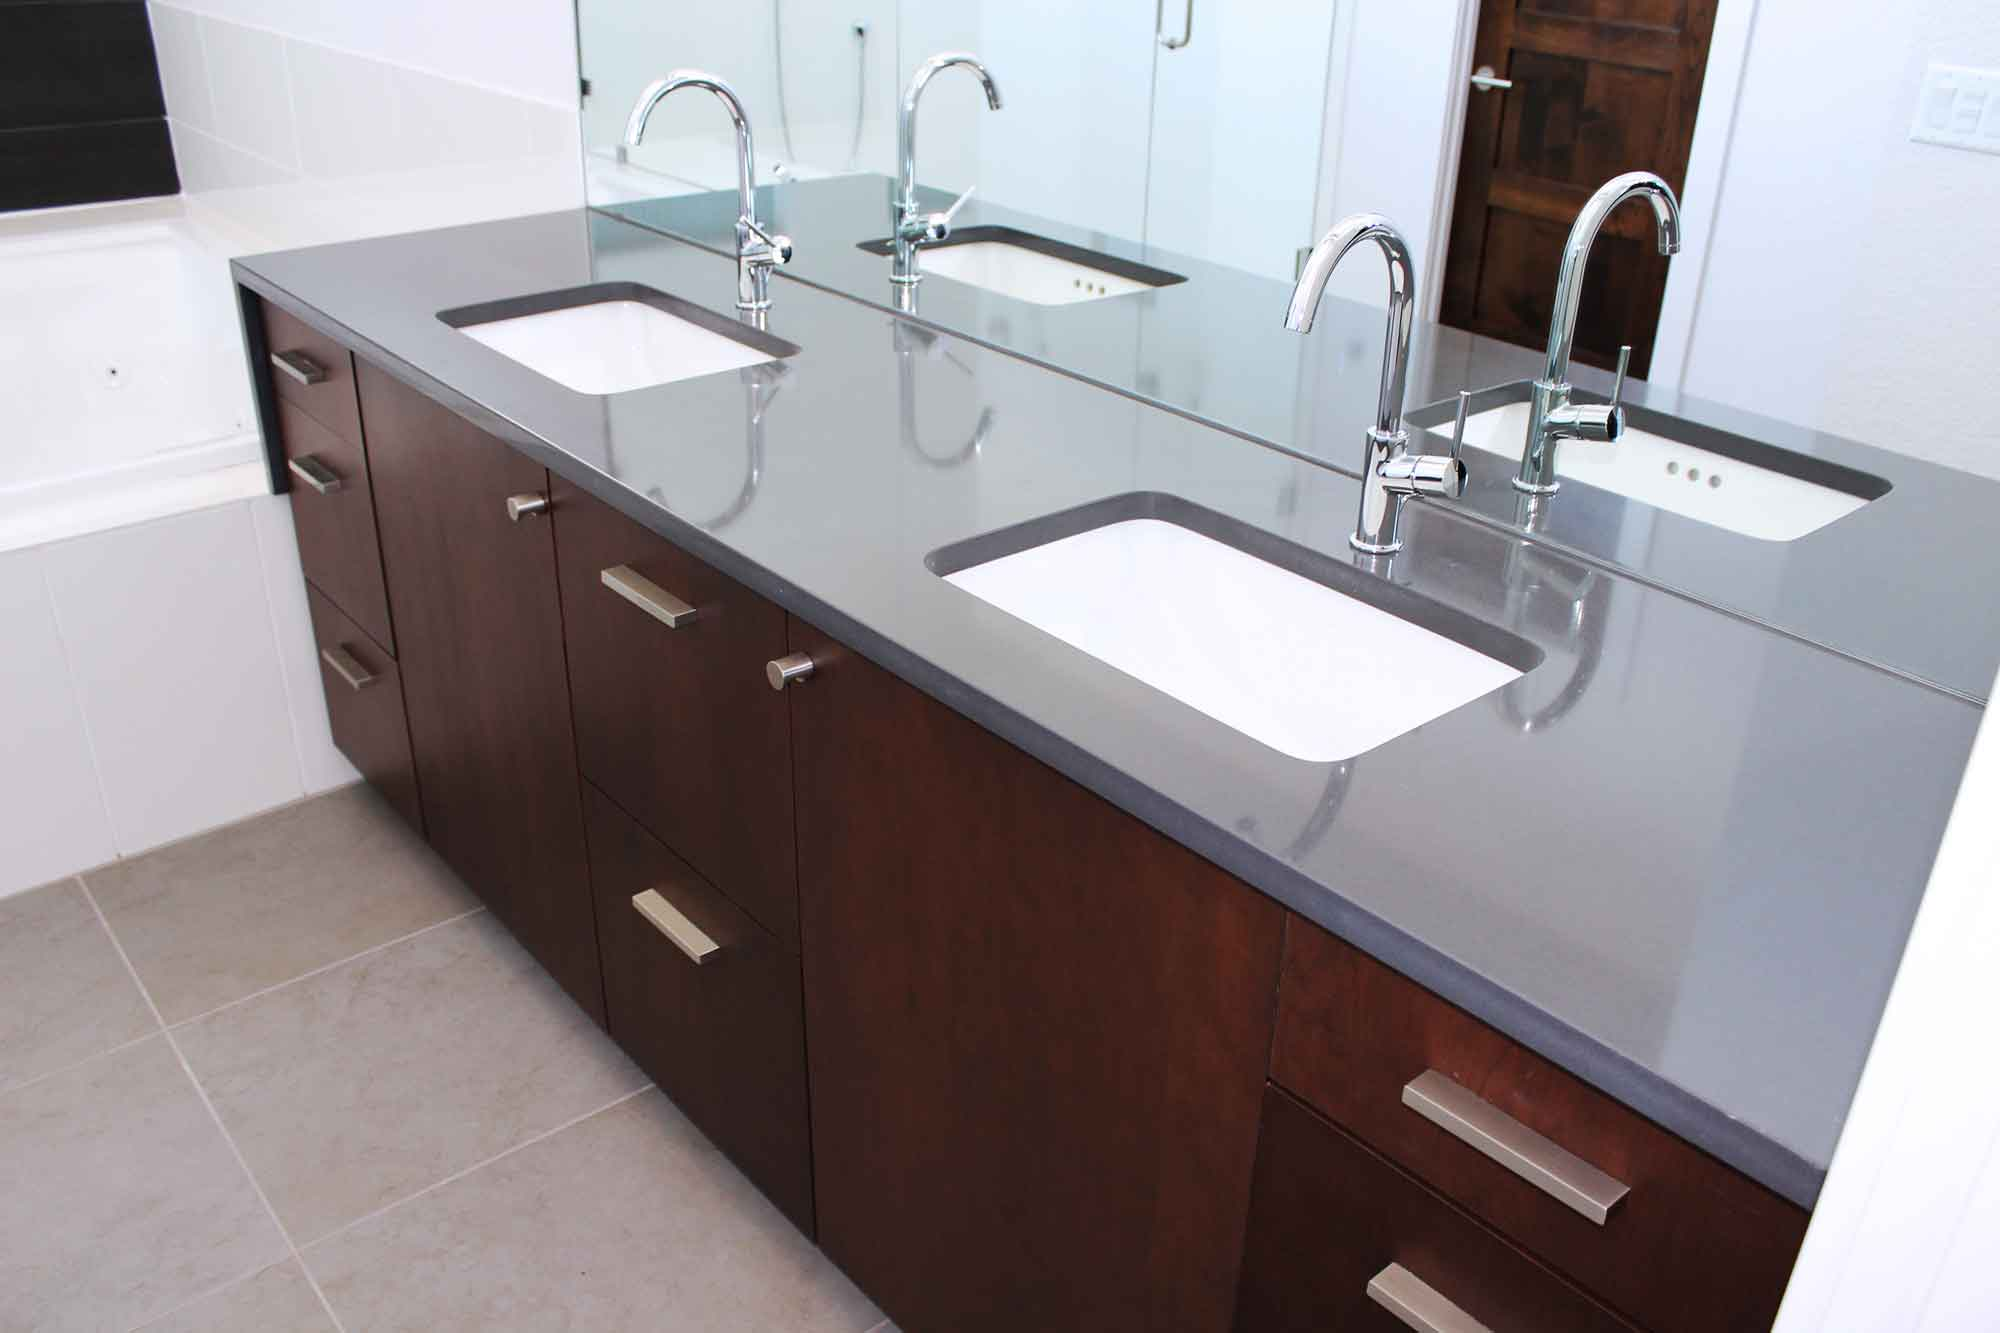 Bathroom-3-Countertop-LevelLOW.jpg